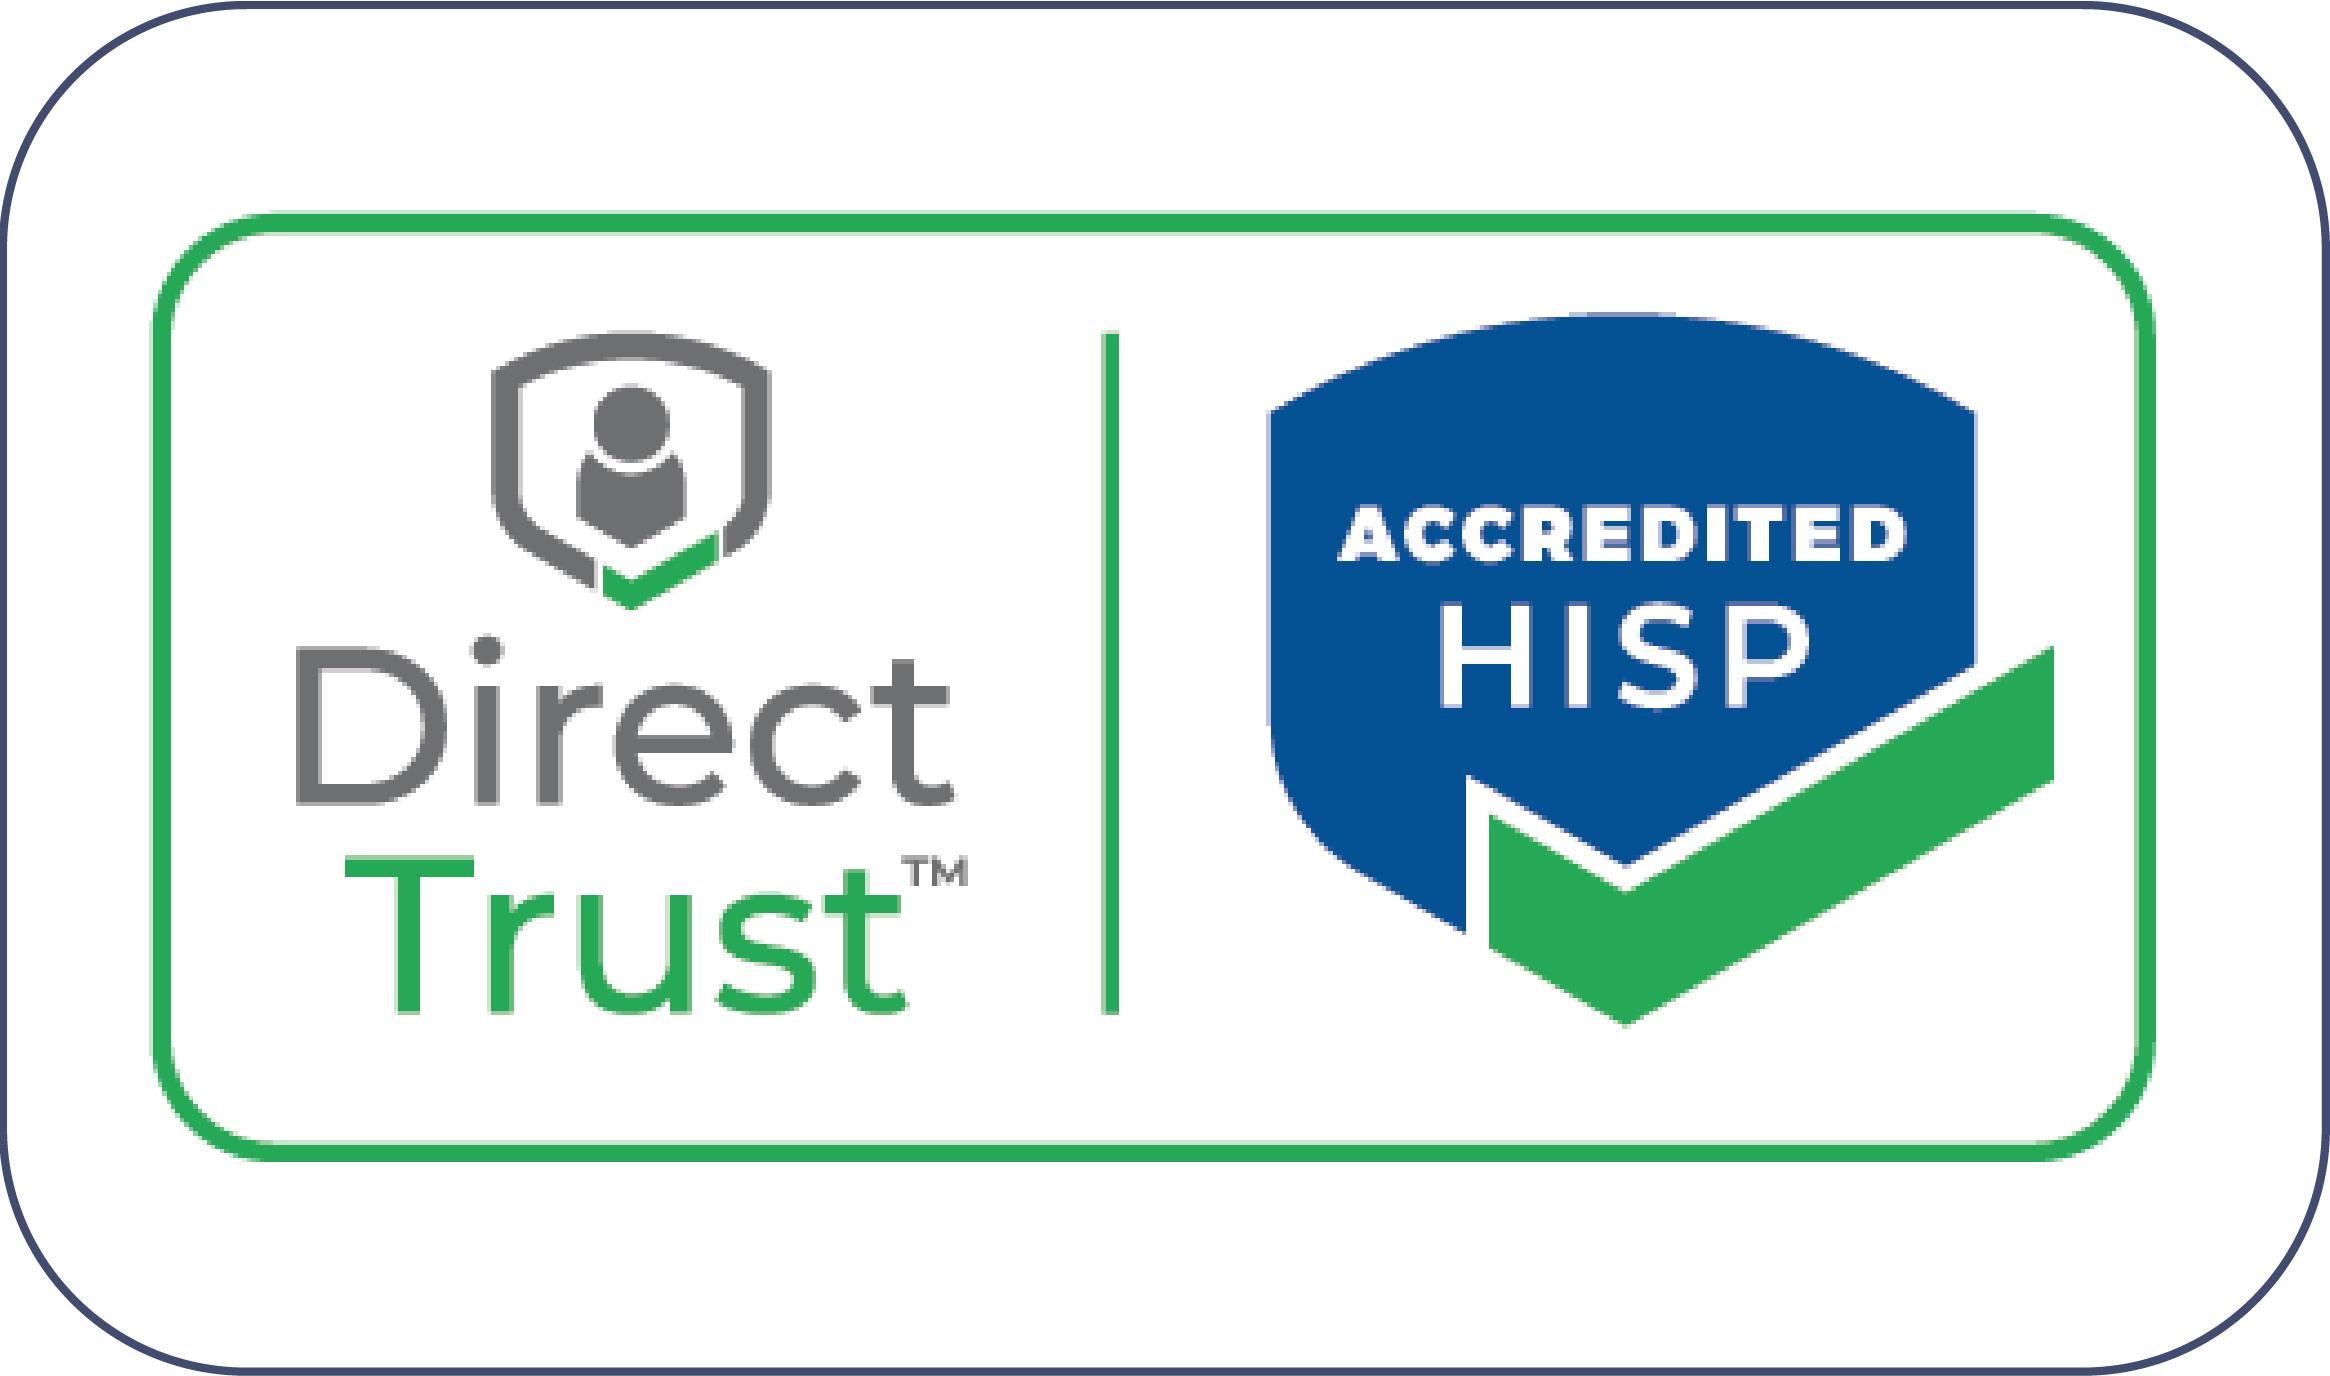 DirectTrust Accredited HISP